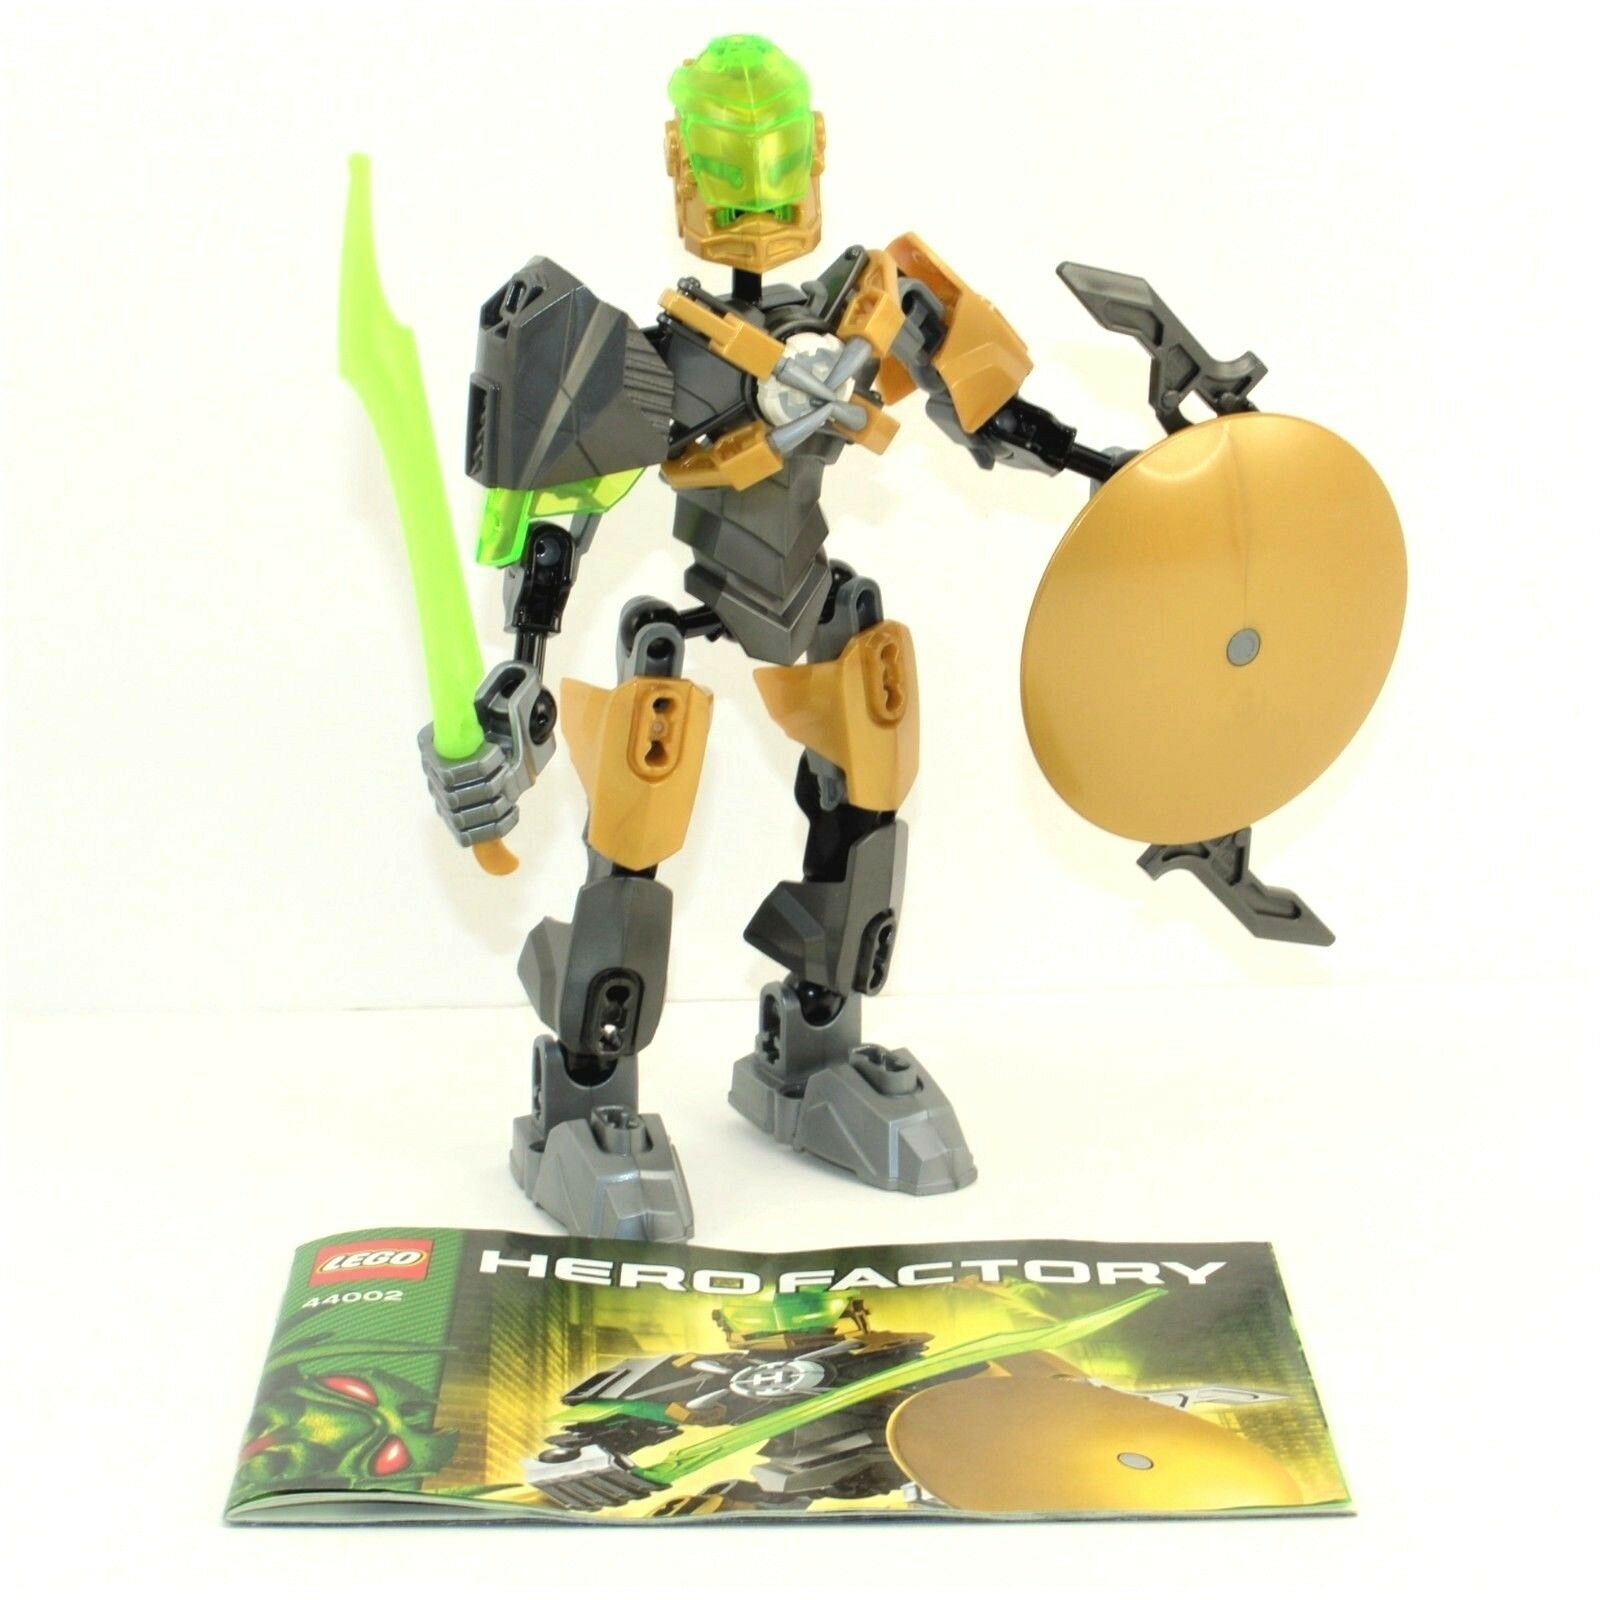 Lego Hero Factory 6025160 Rocka 44002 Ebay